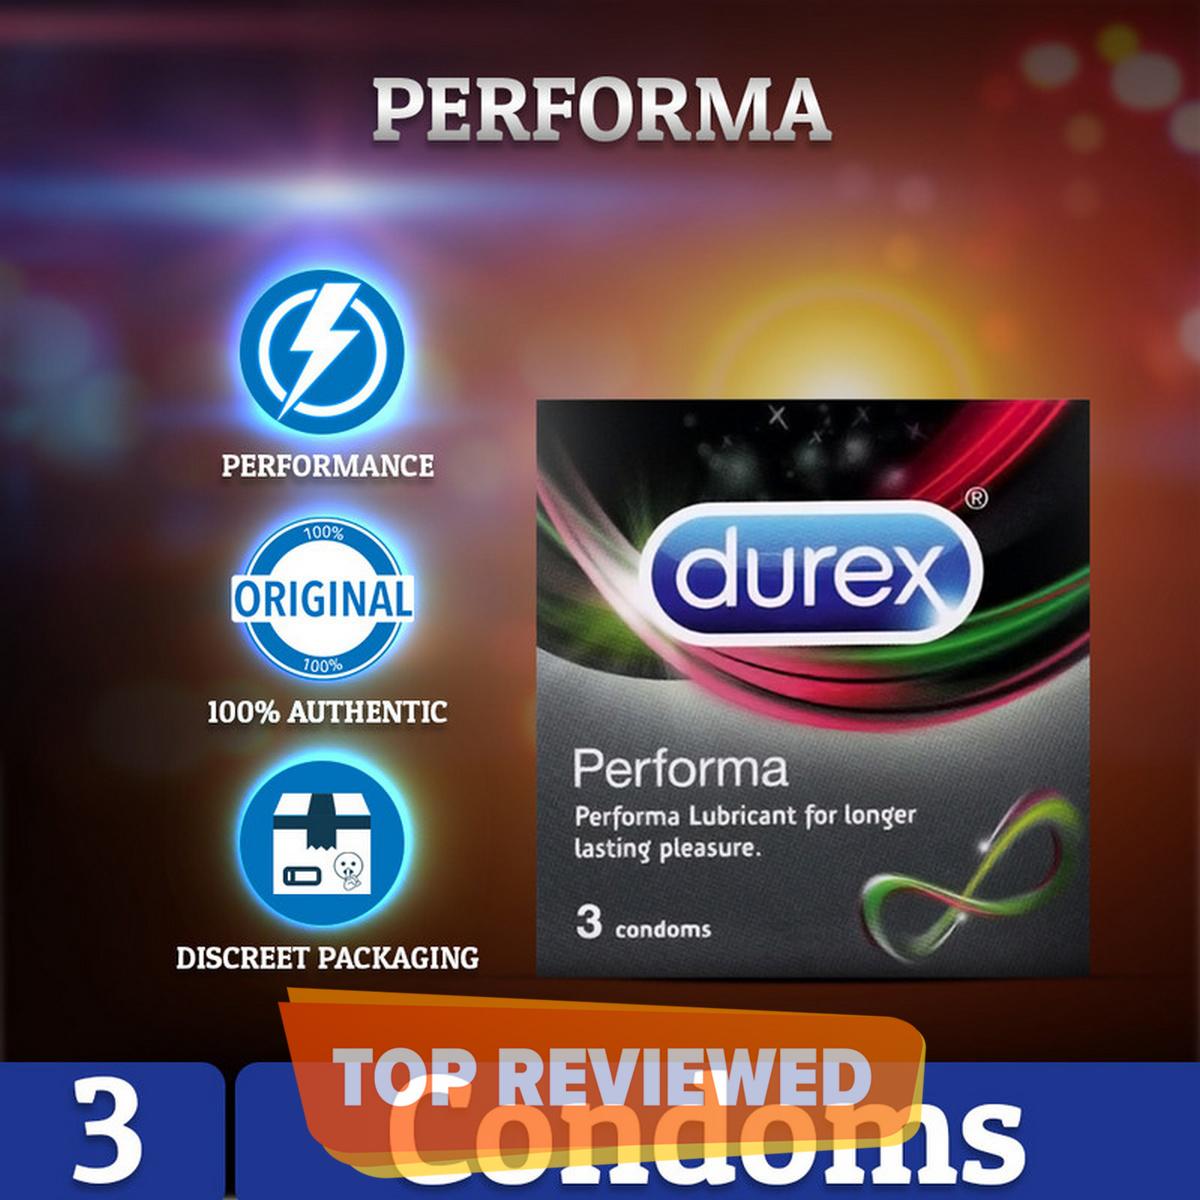 Durex Performa Pack of 3 Sachets